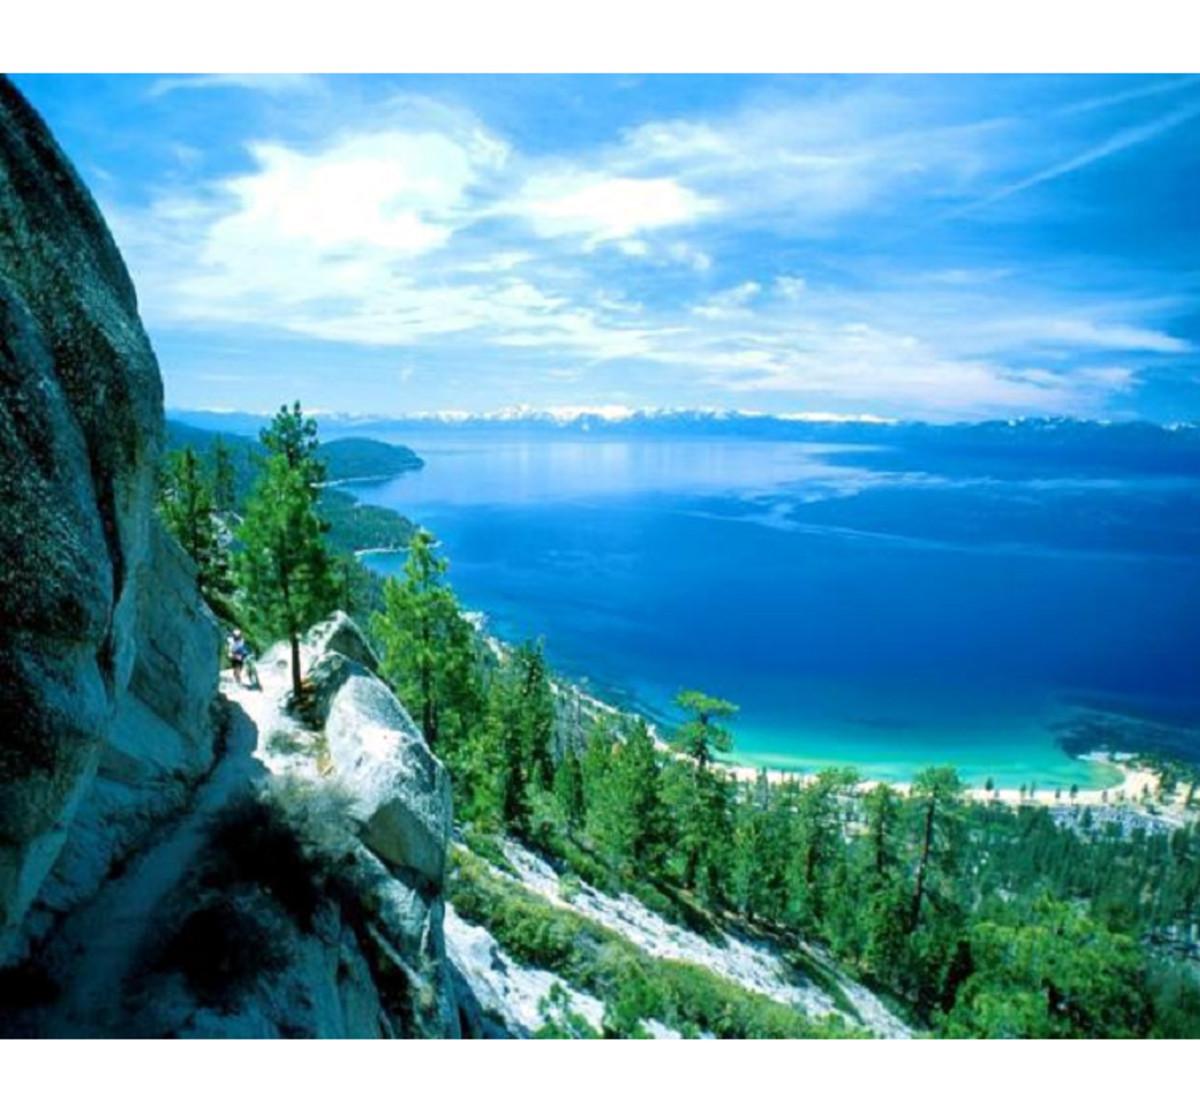 Lake Tahoe - Top 10 Things to do!